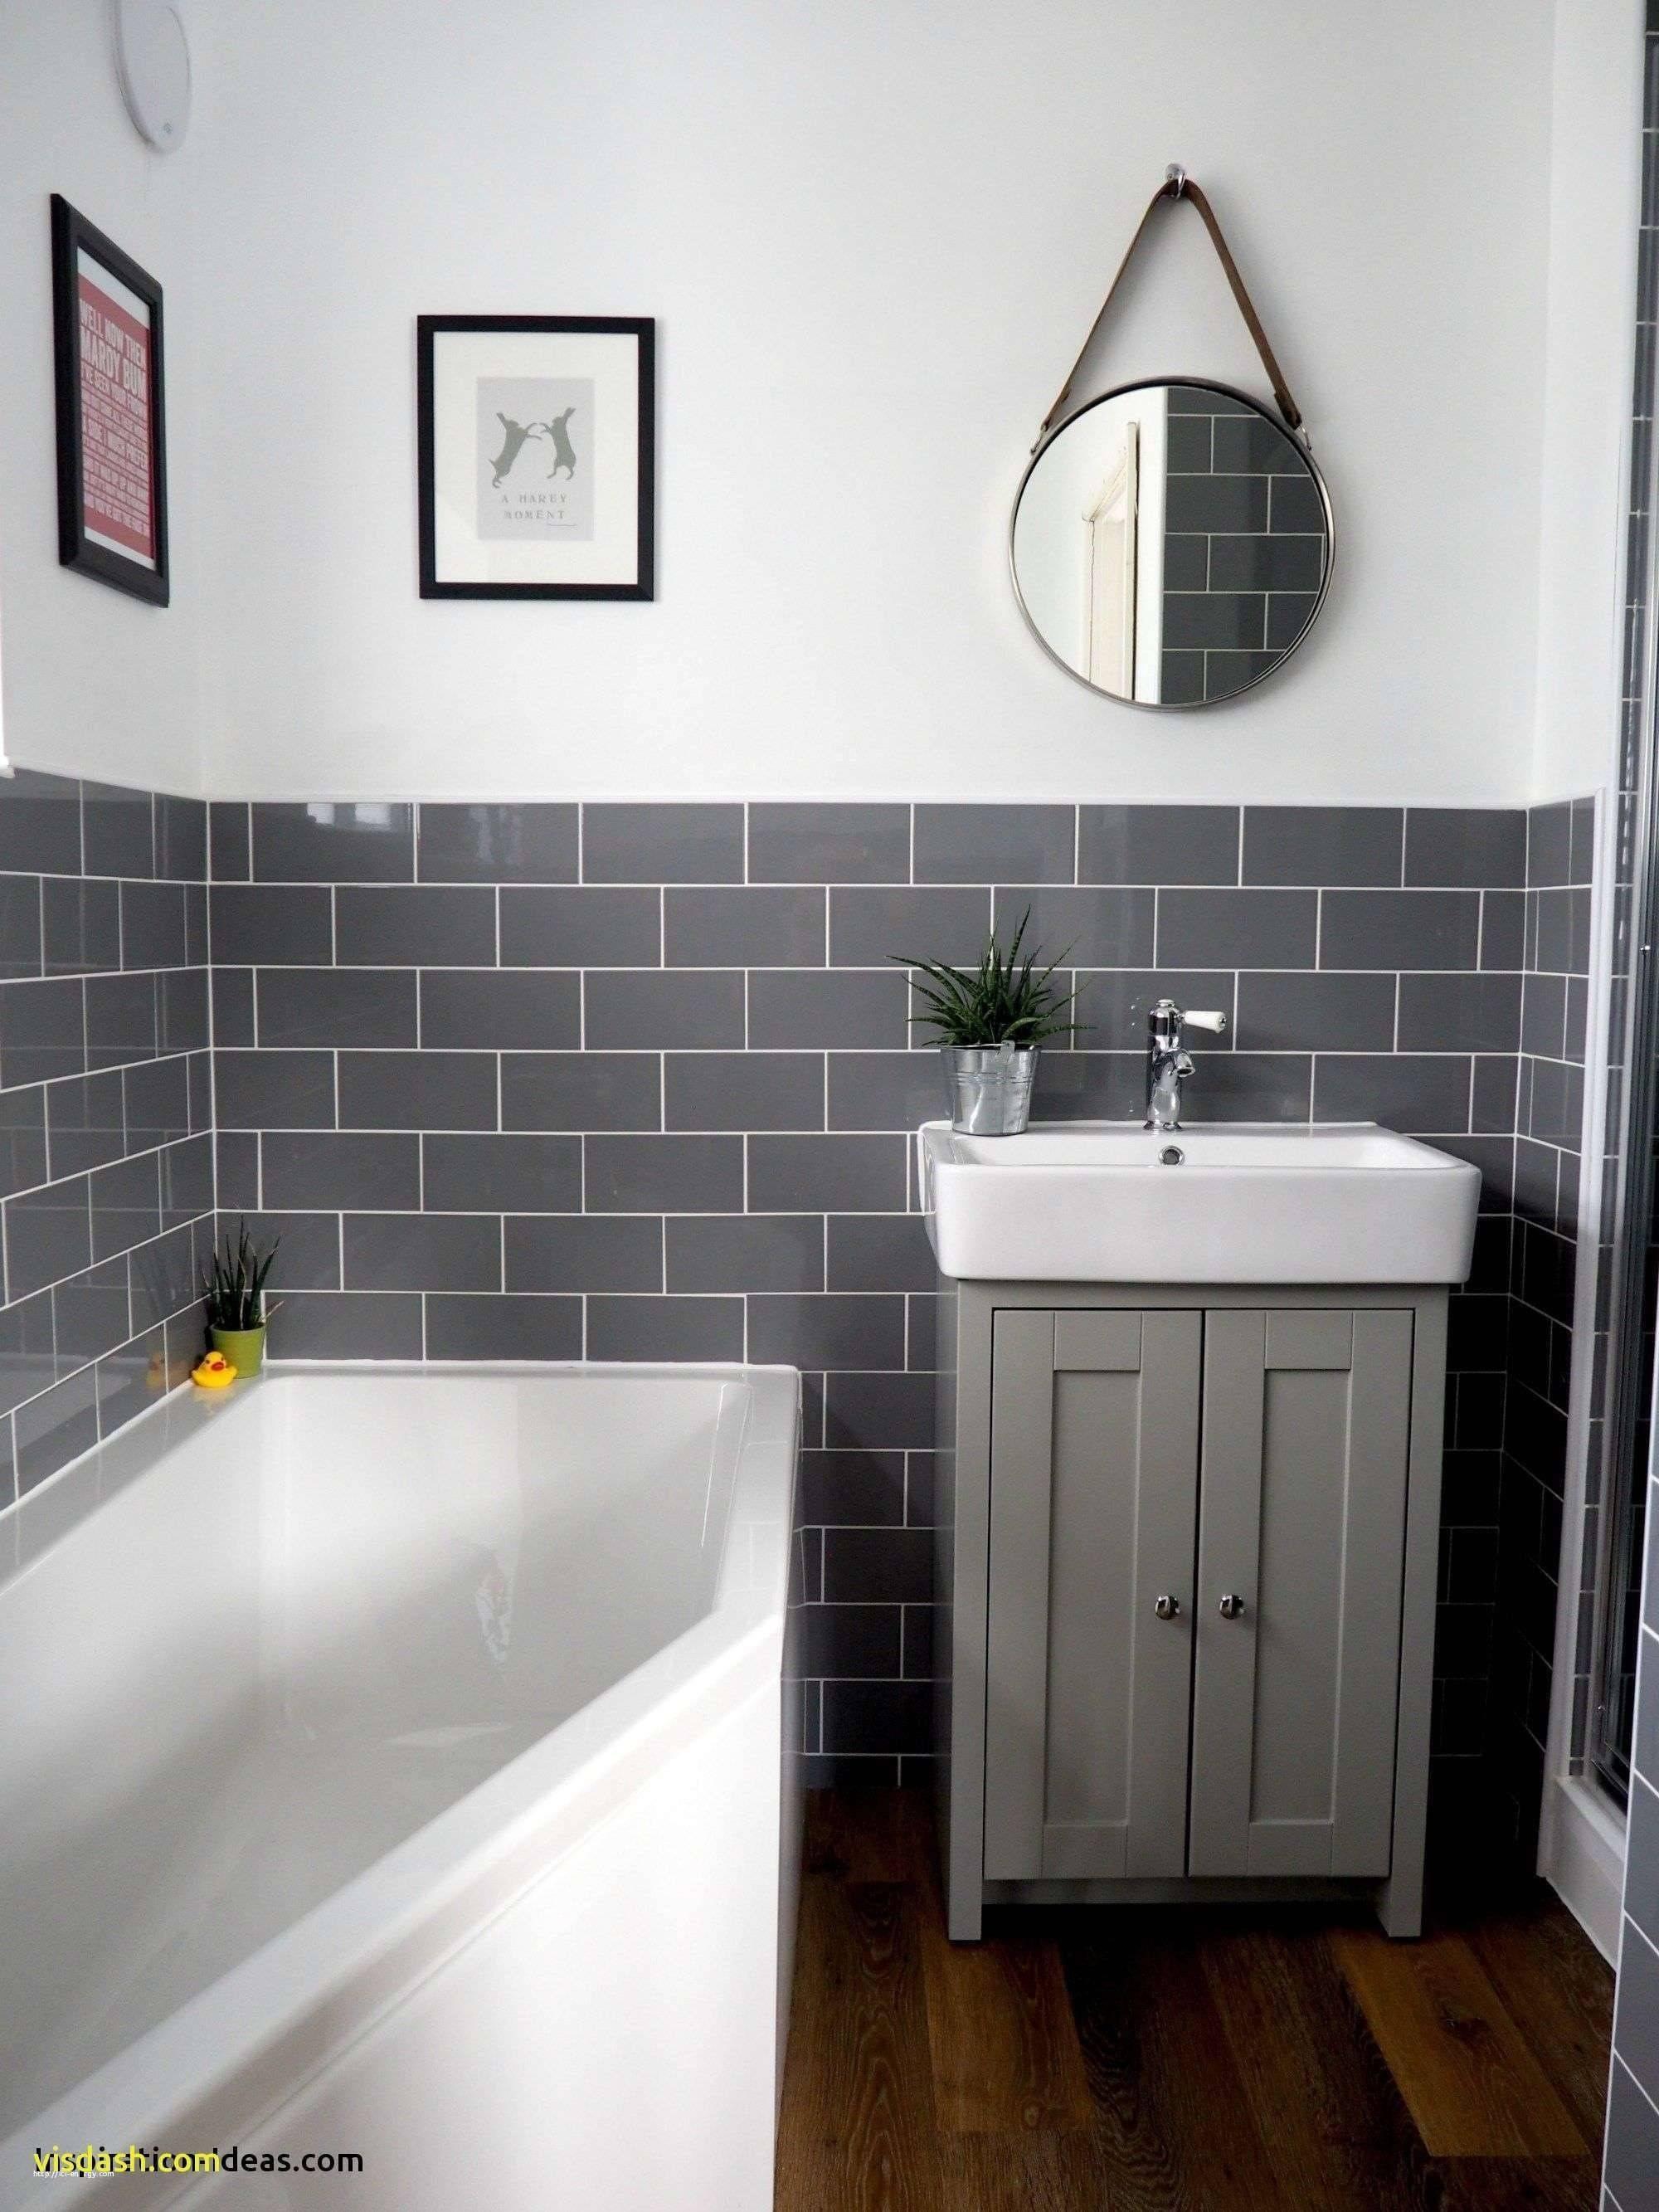 shower tile ideas astonishing best small bathroom remodel s bathroom elegant ideas 0d ideas with photo